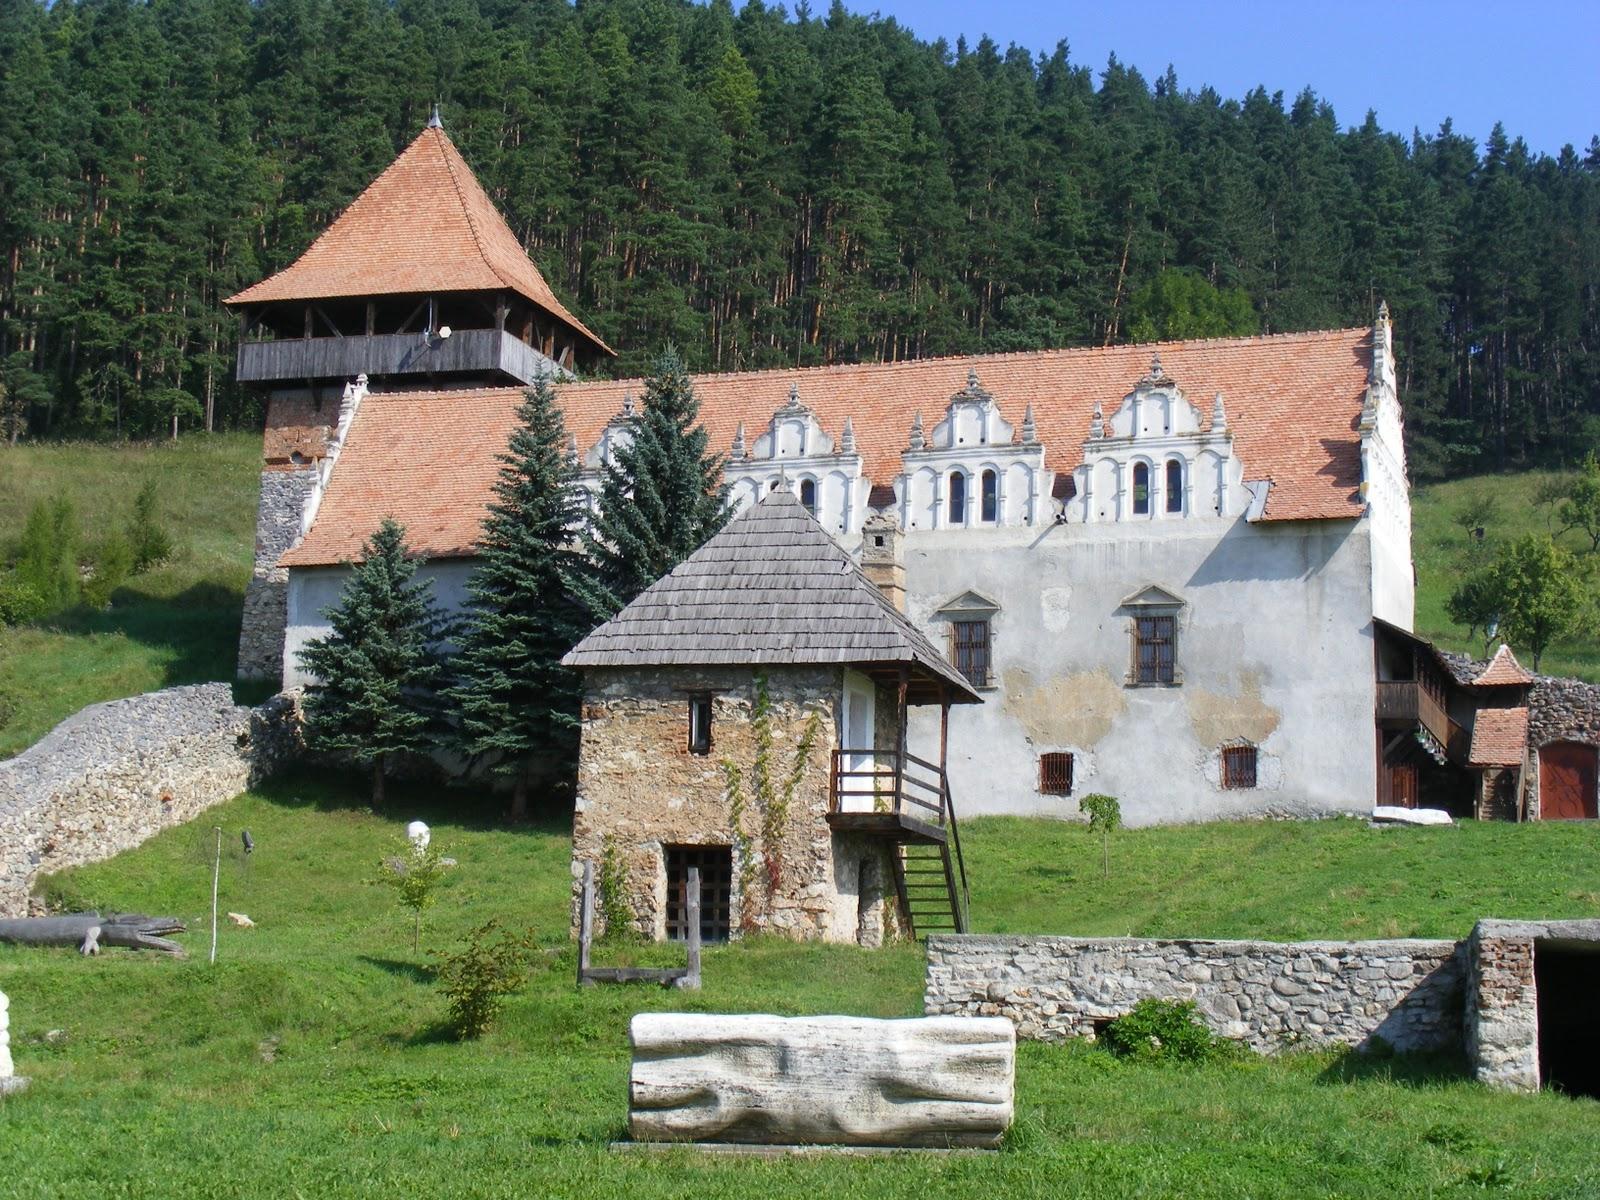 http://www.turistintransilvania.com/wp-content/uploads/2012/11/castelul-lazar.jpg